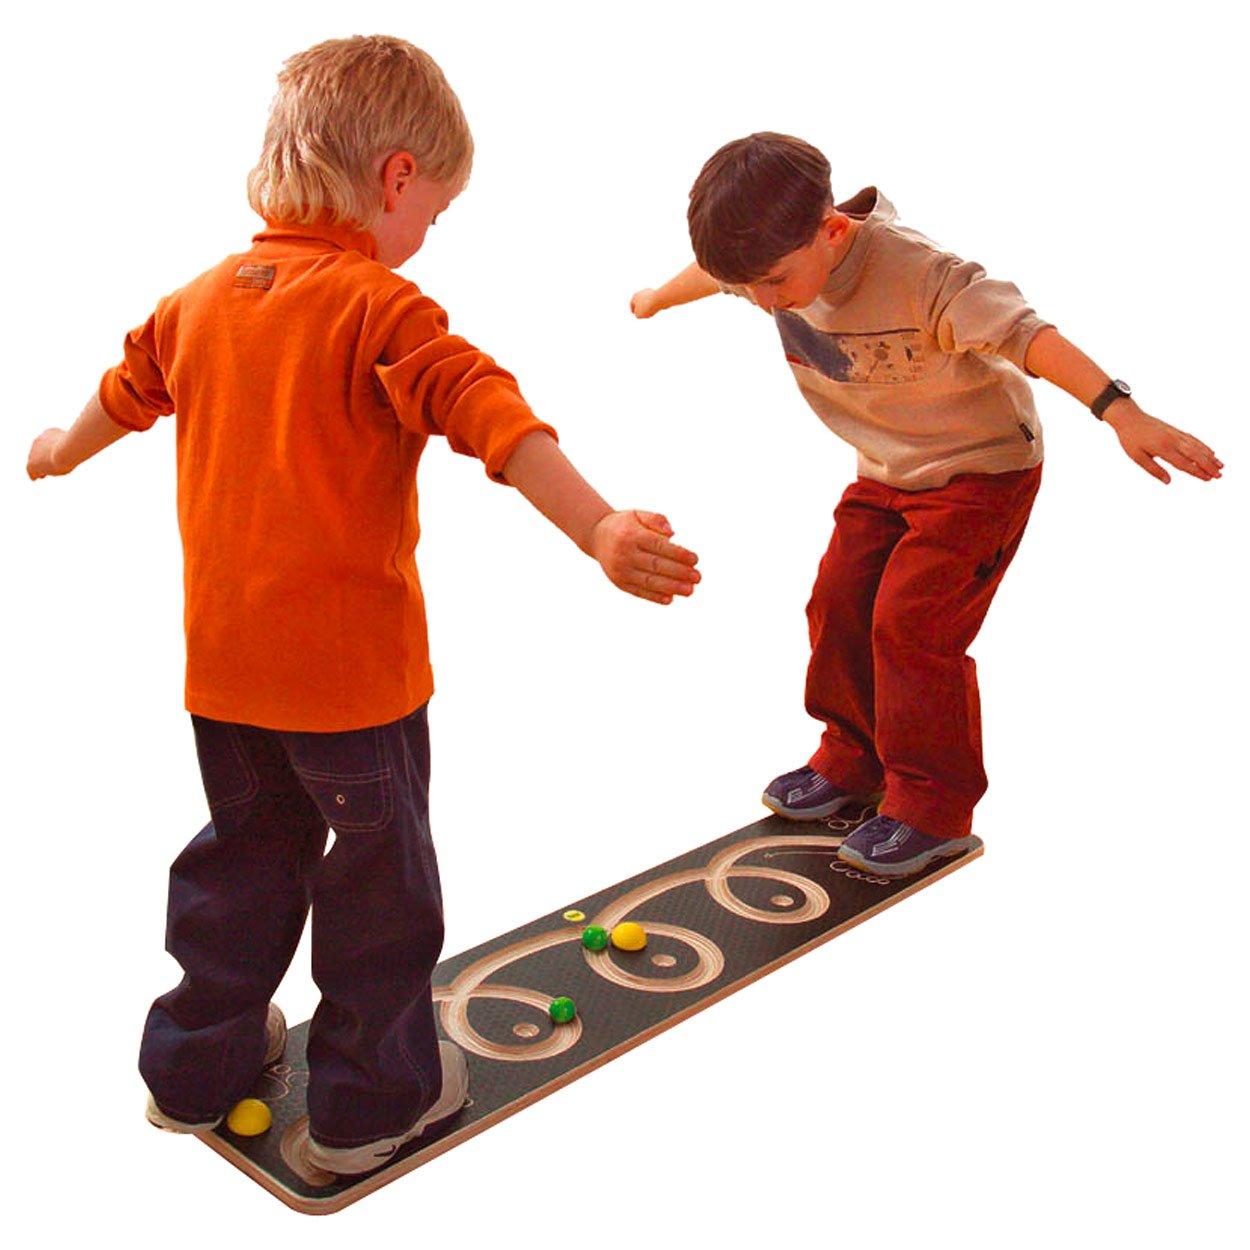 Balancierbrett Wendel mit 3 Kugeln, Balancierspiel, Kinder, Balance Spiel